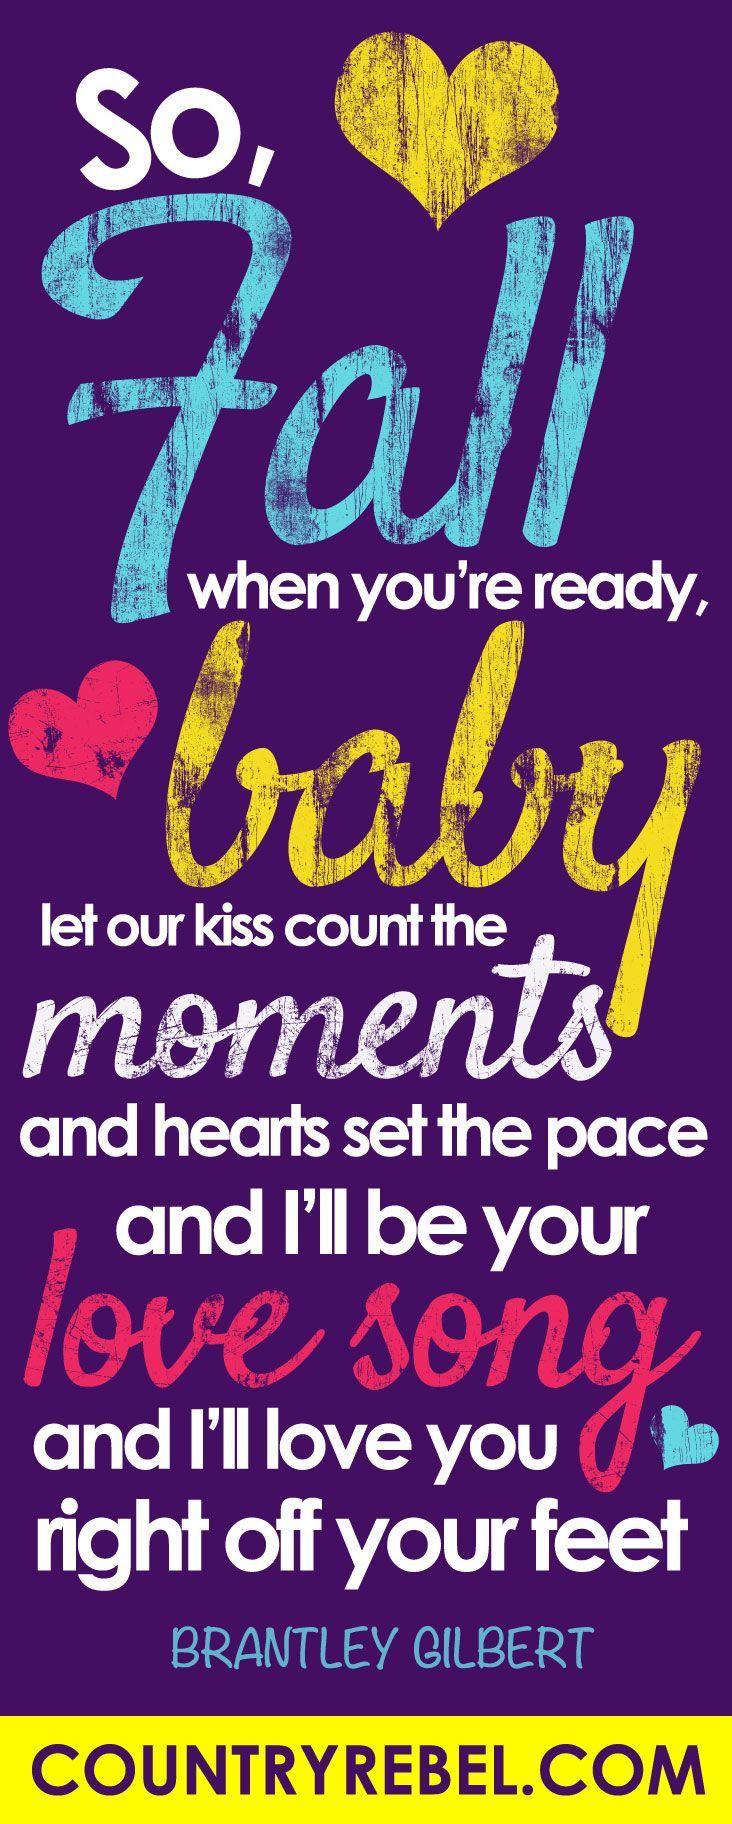 Mike D. Angelo - Oh Baby I Lyrics | Musixmatch